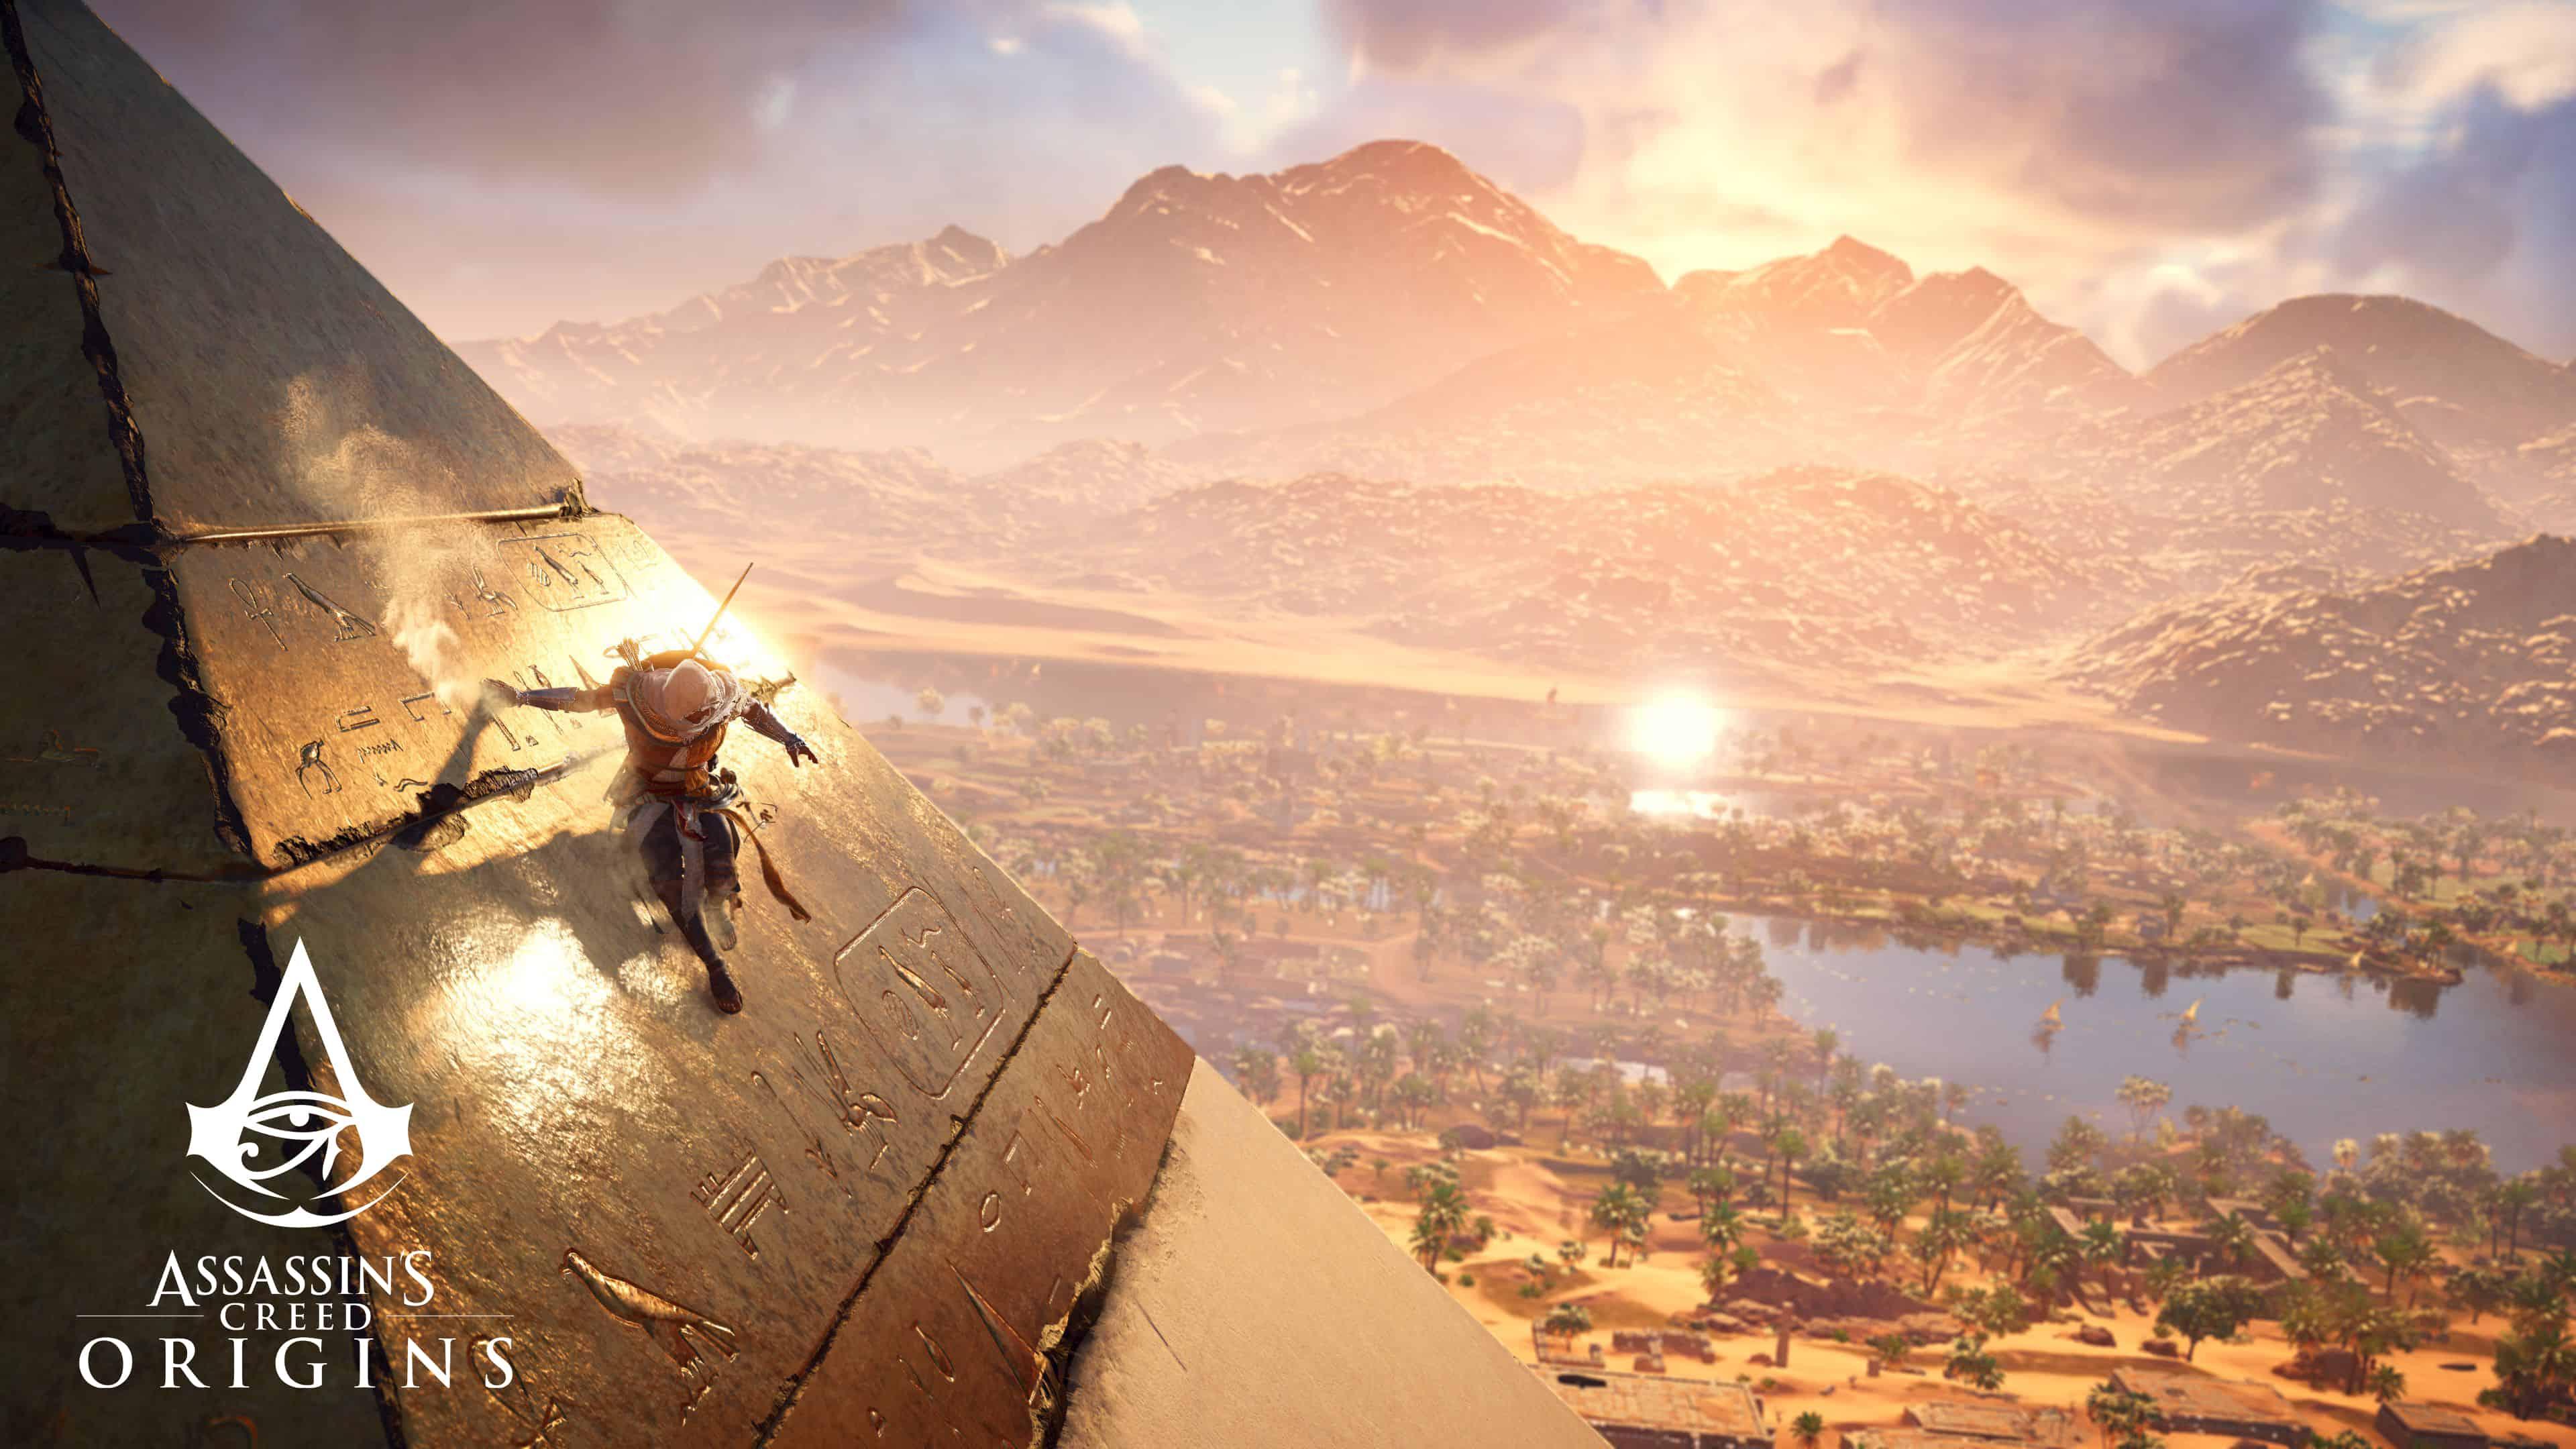 assassins creed origins bayek pyramid uhd 4k wallpaper